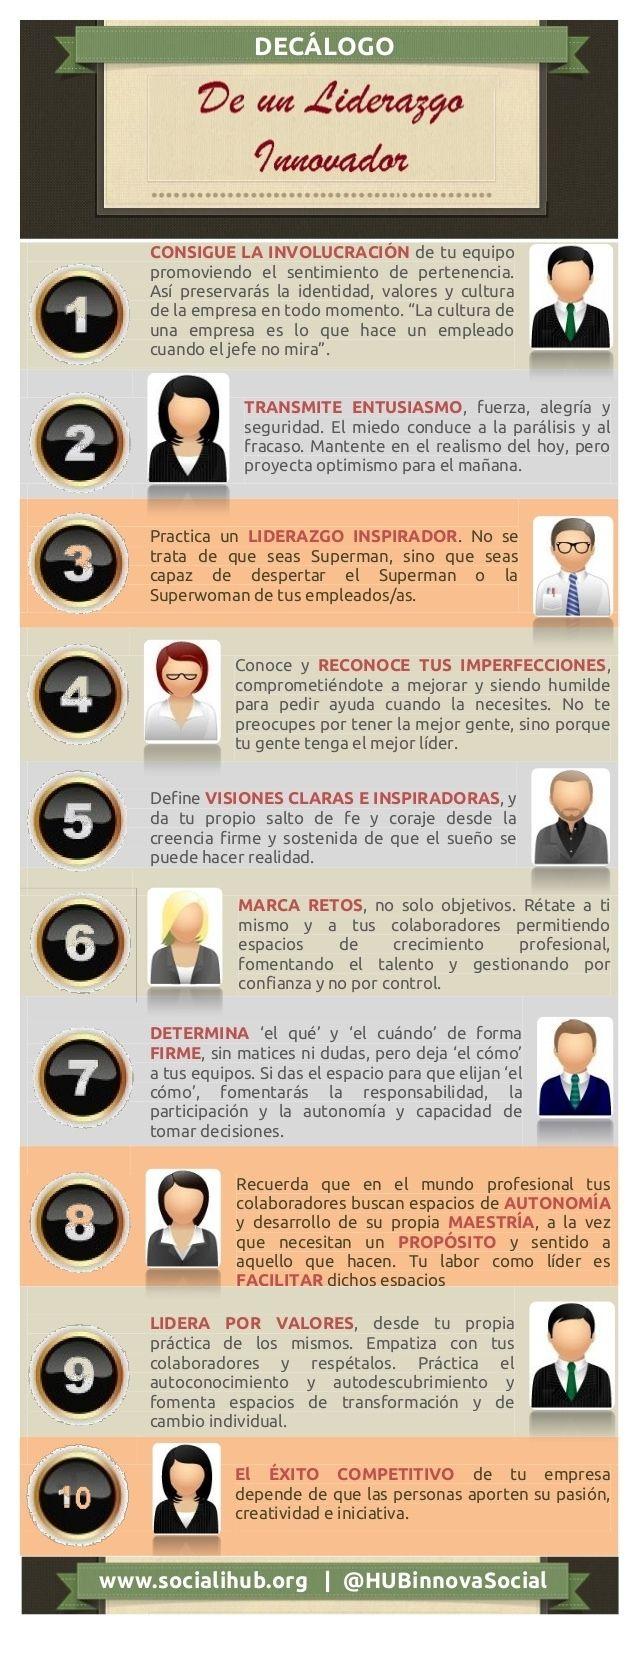 89 best Gen Z images on Pinterest   Spain, Spanish and Spanish language